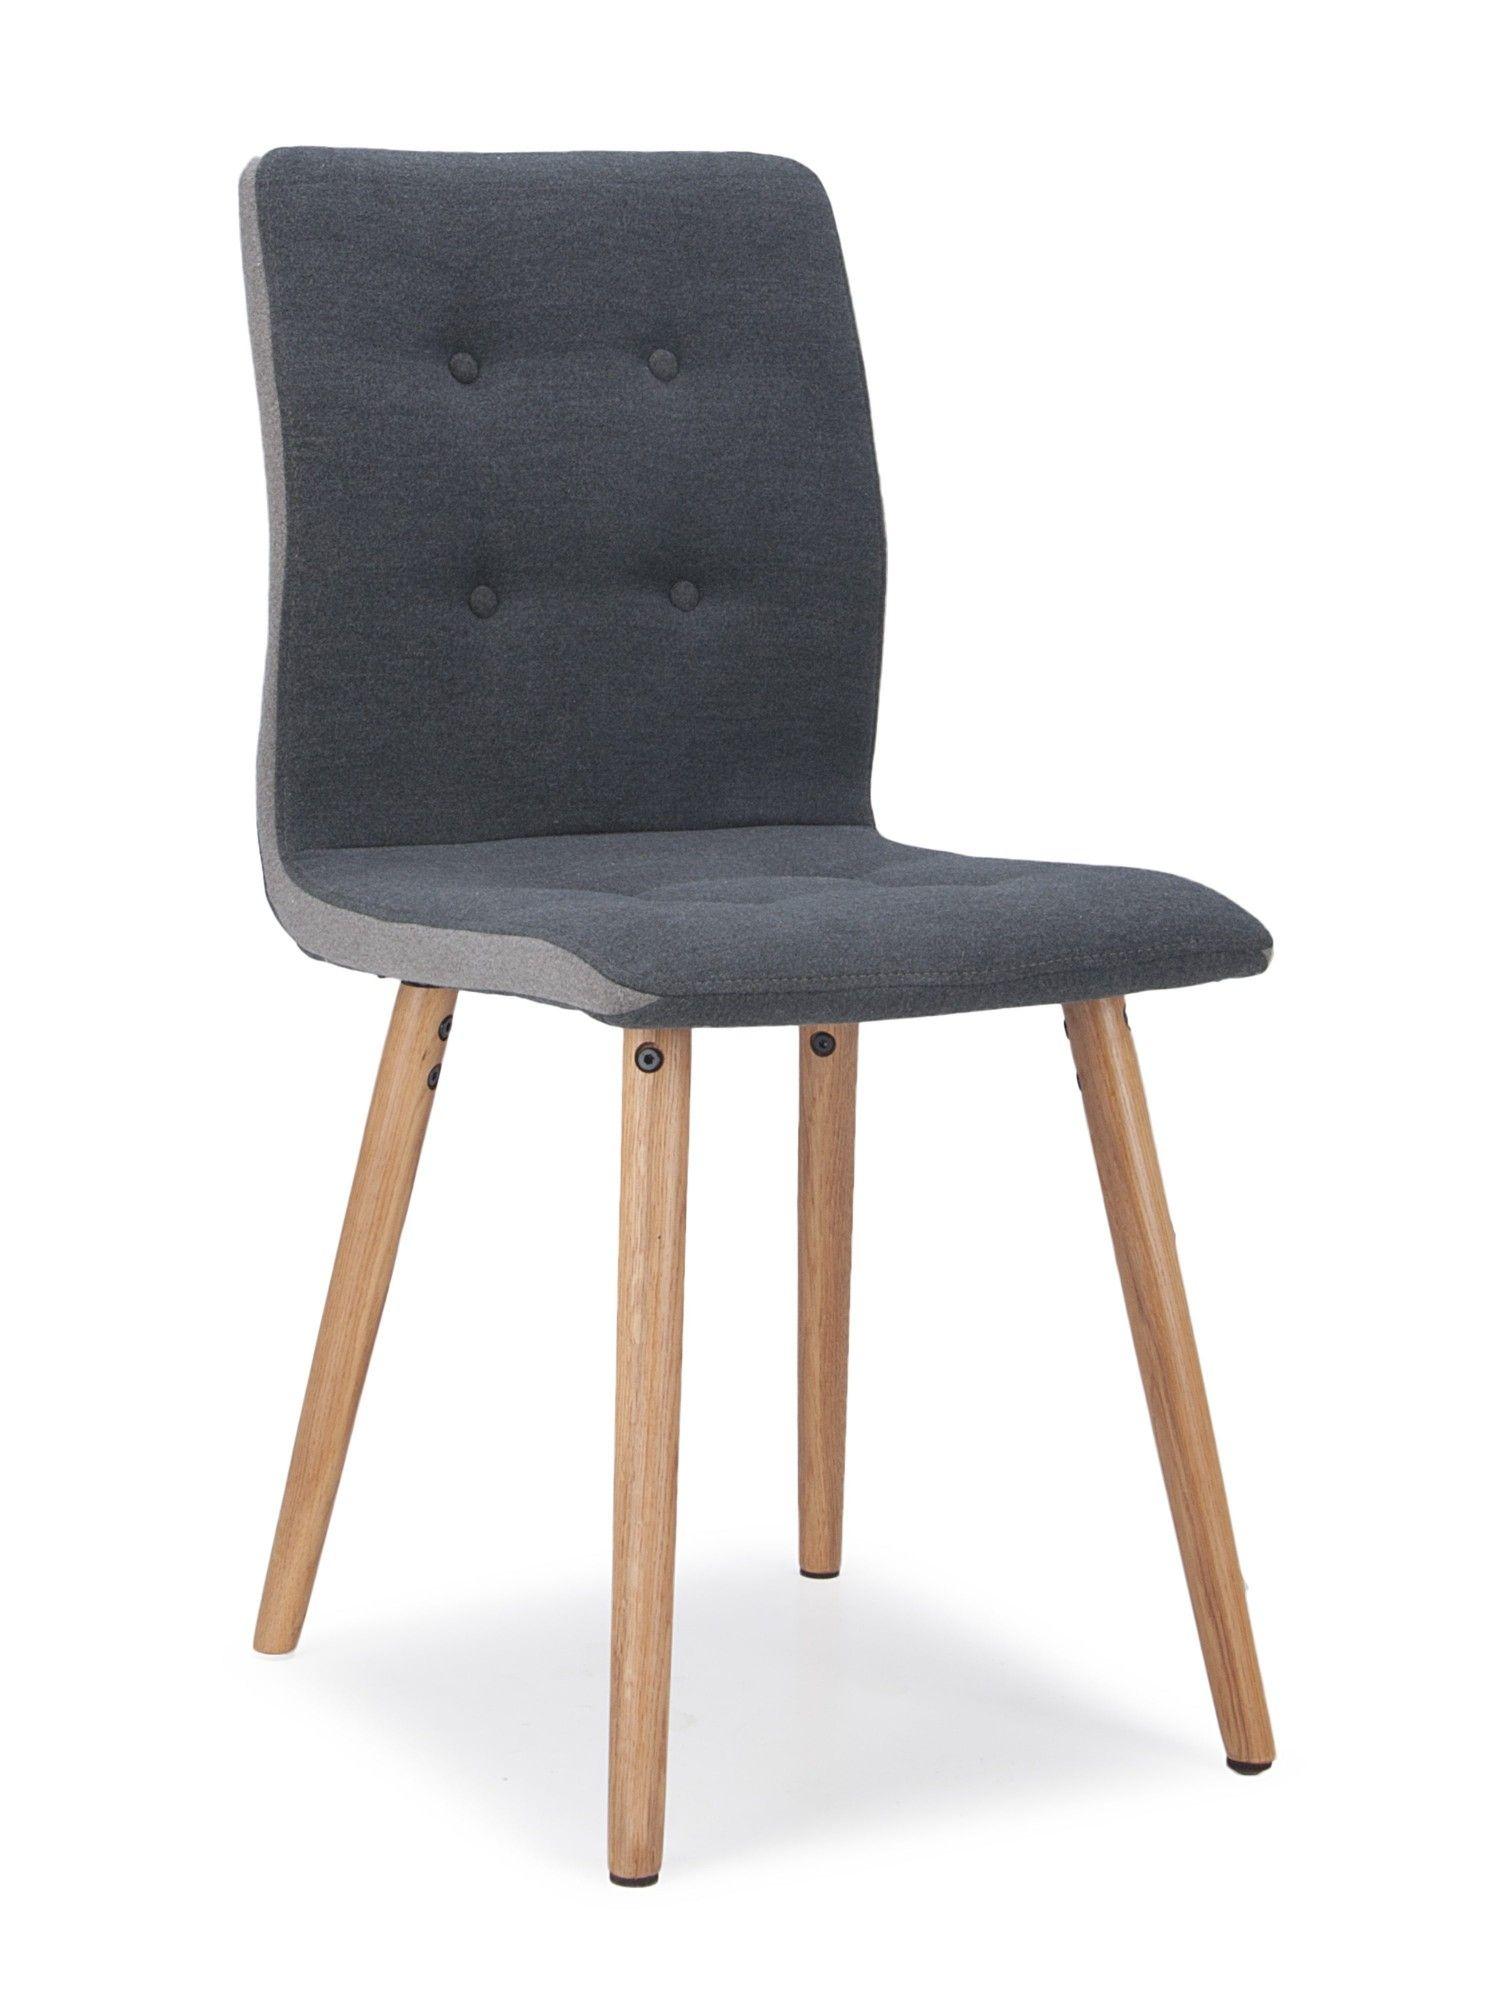 Stuhl esszimmer wohnzimmer st hle k che polsterstuhl for Stuhl design esszimmer